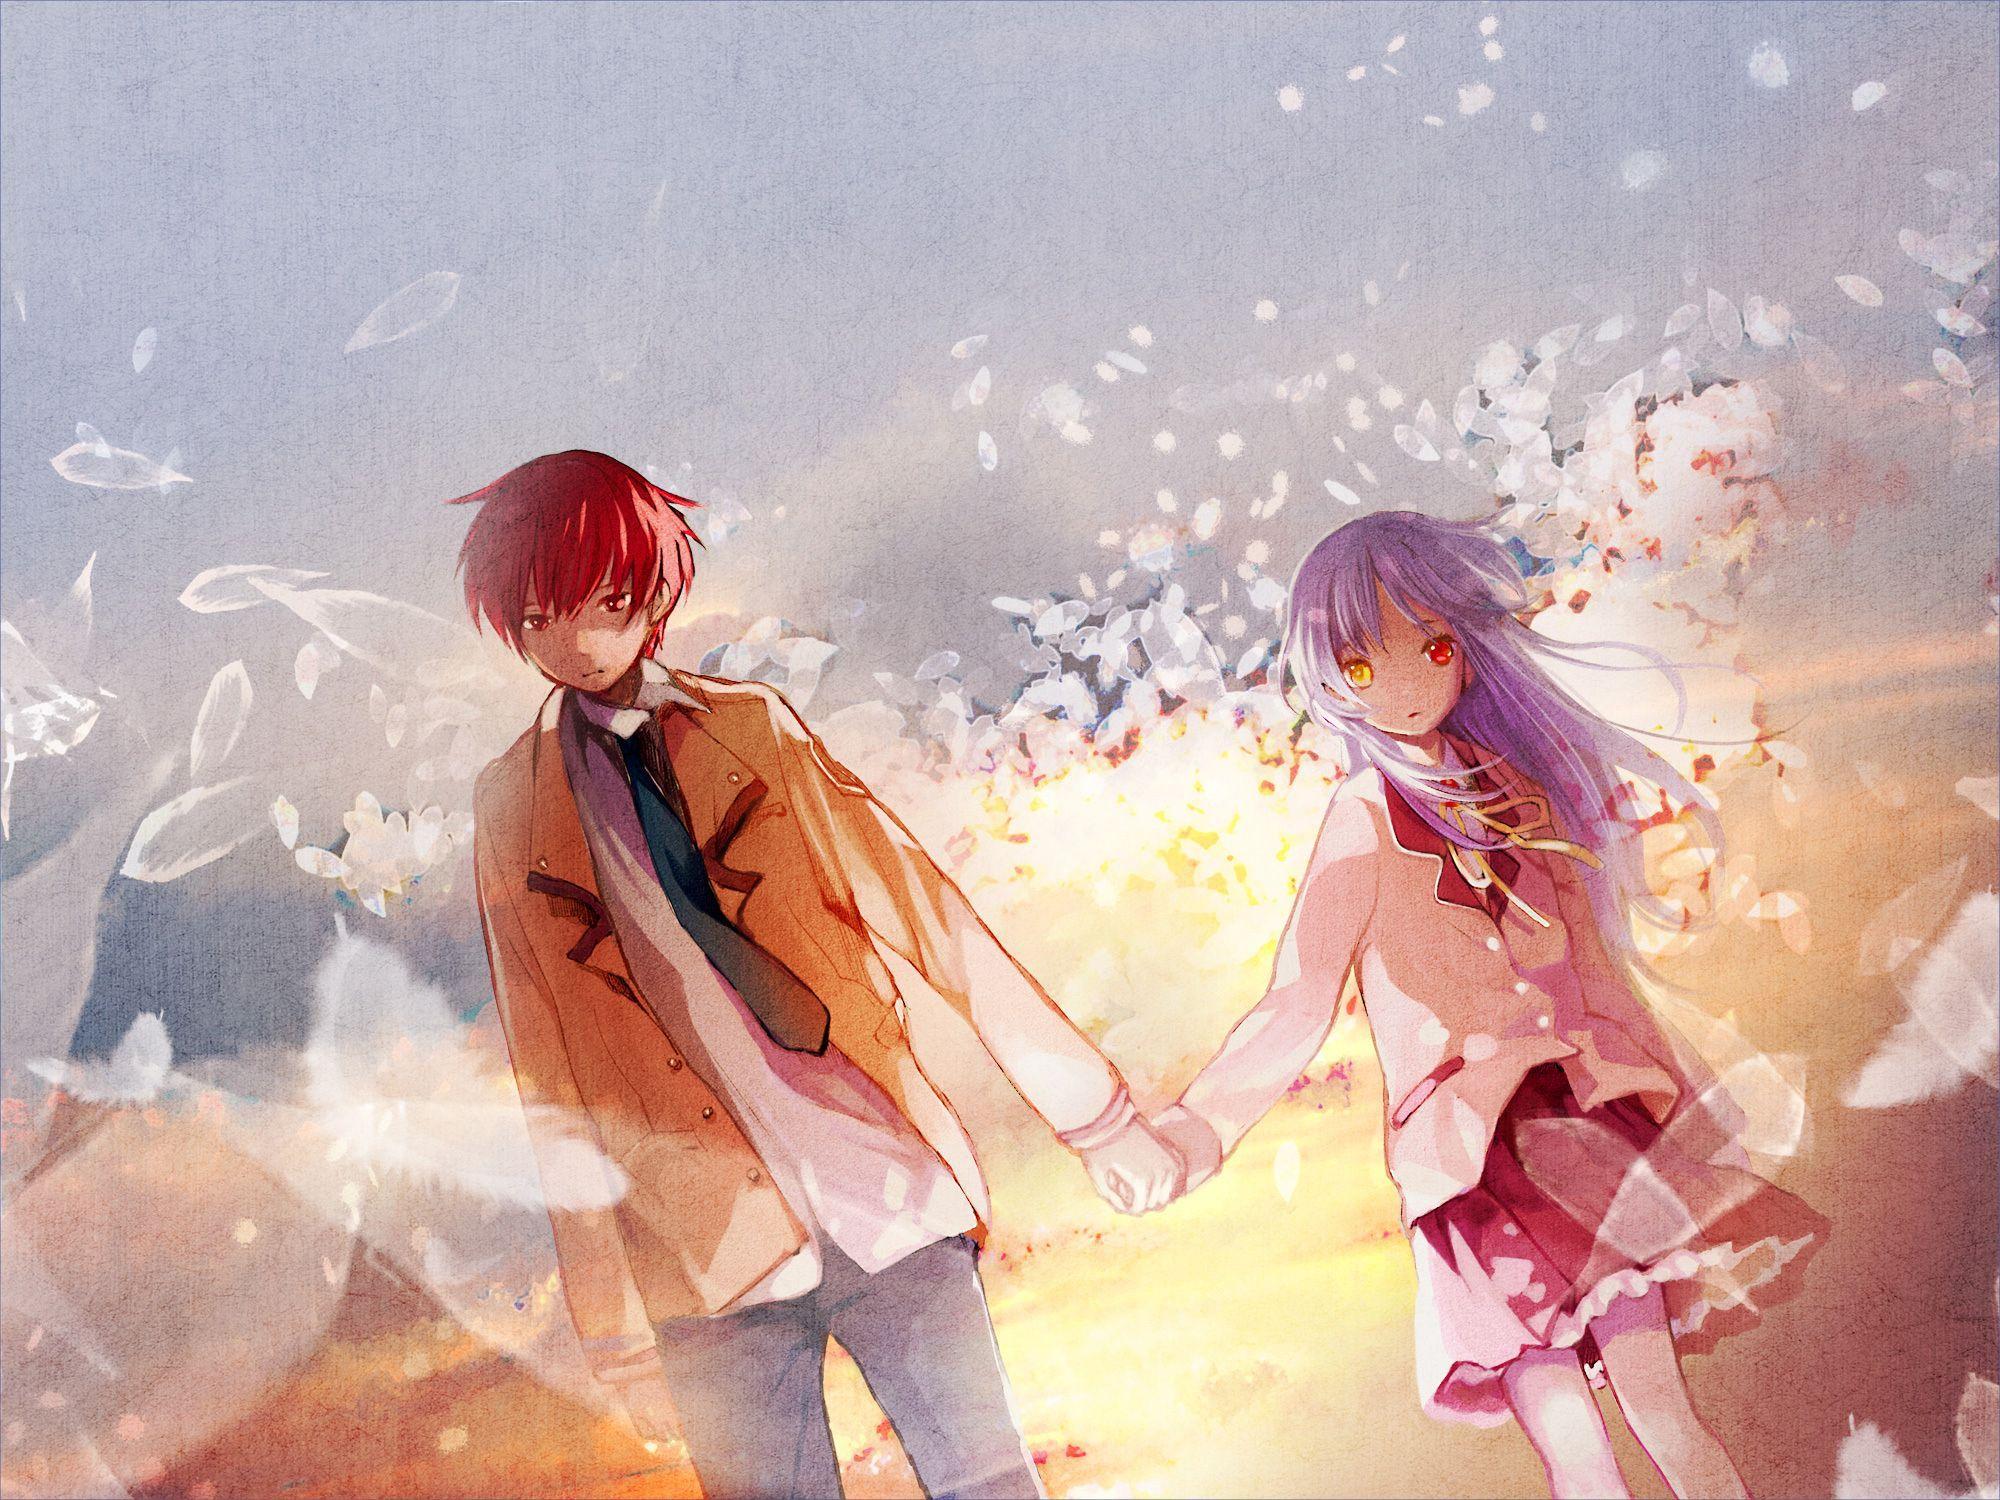 7200 Koleksi Wallpaper Anime Romantis Keren HD Terbaru